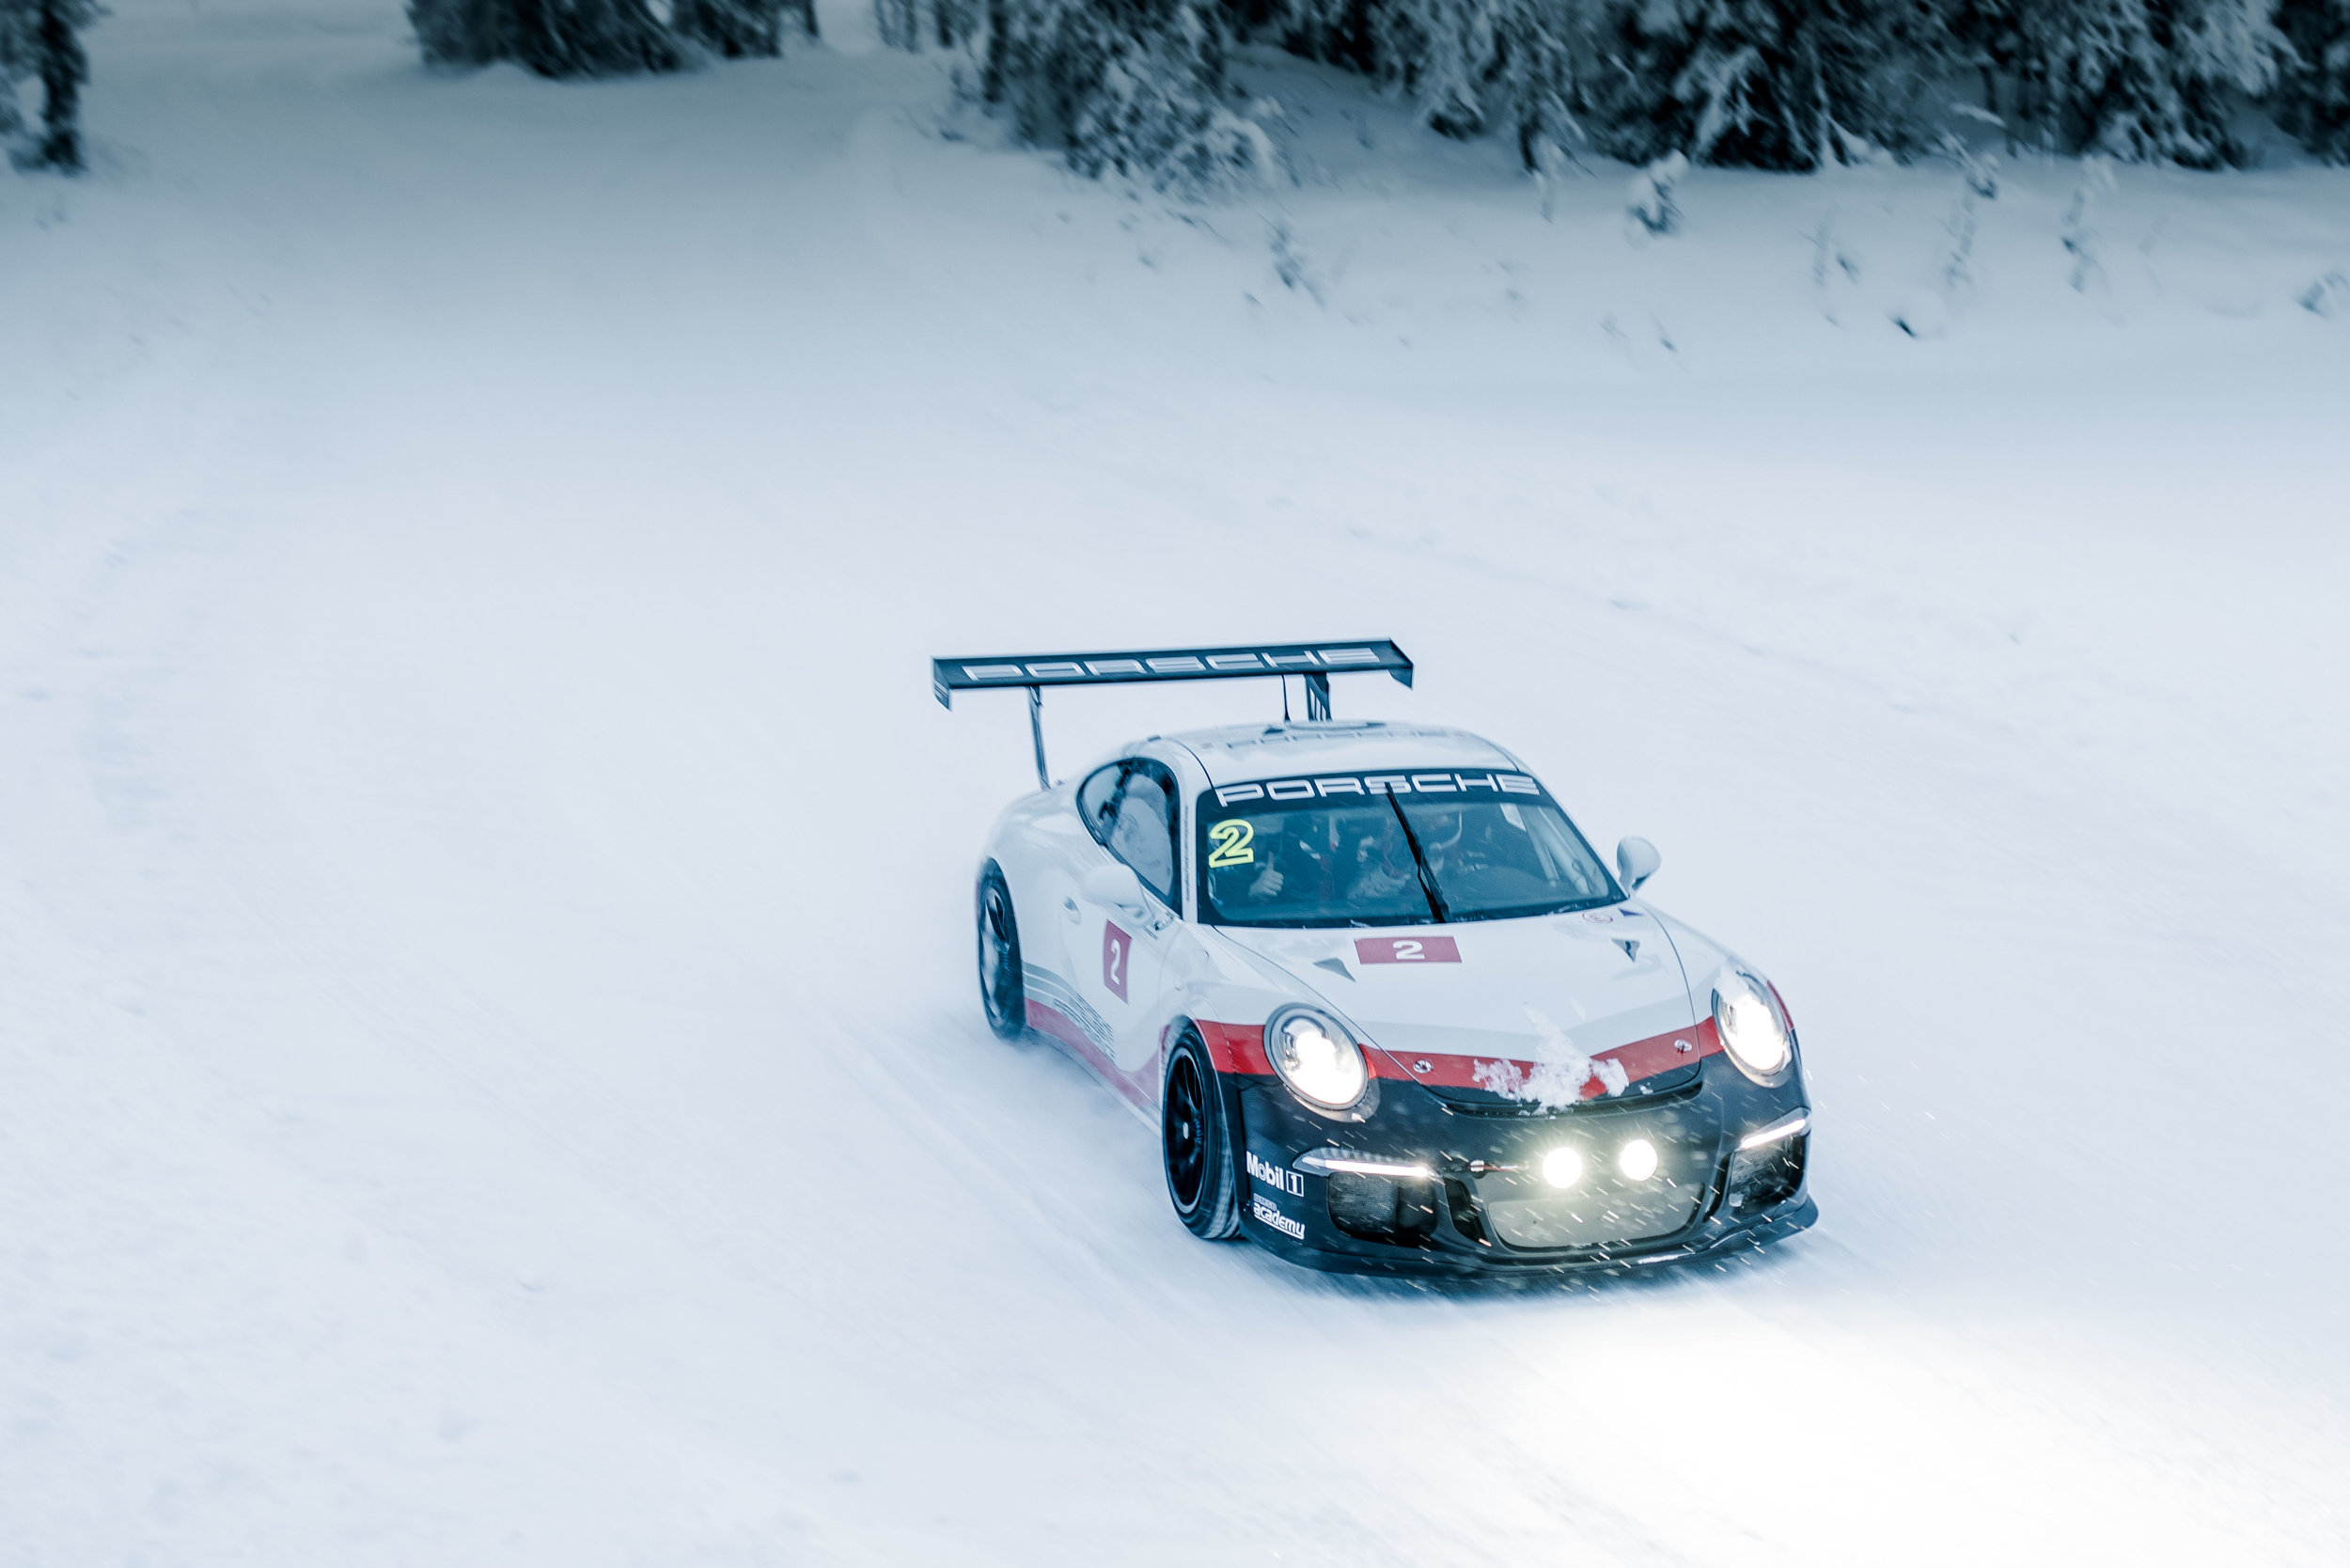 Porsche Ice Experience on Ice_30_01_2019_0297_175654.jpg